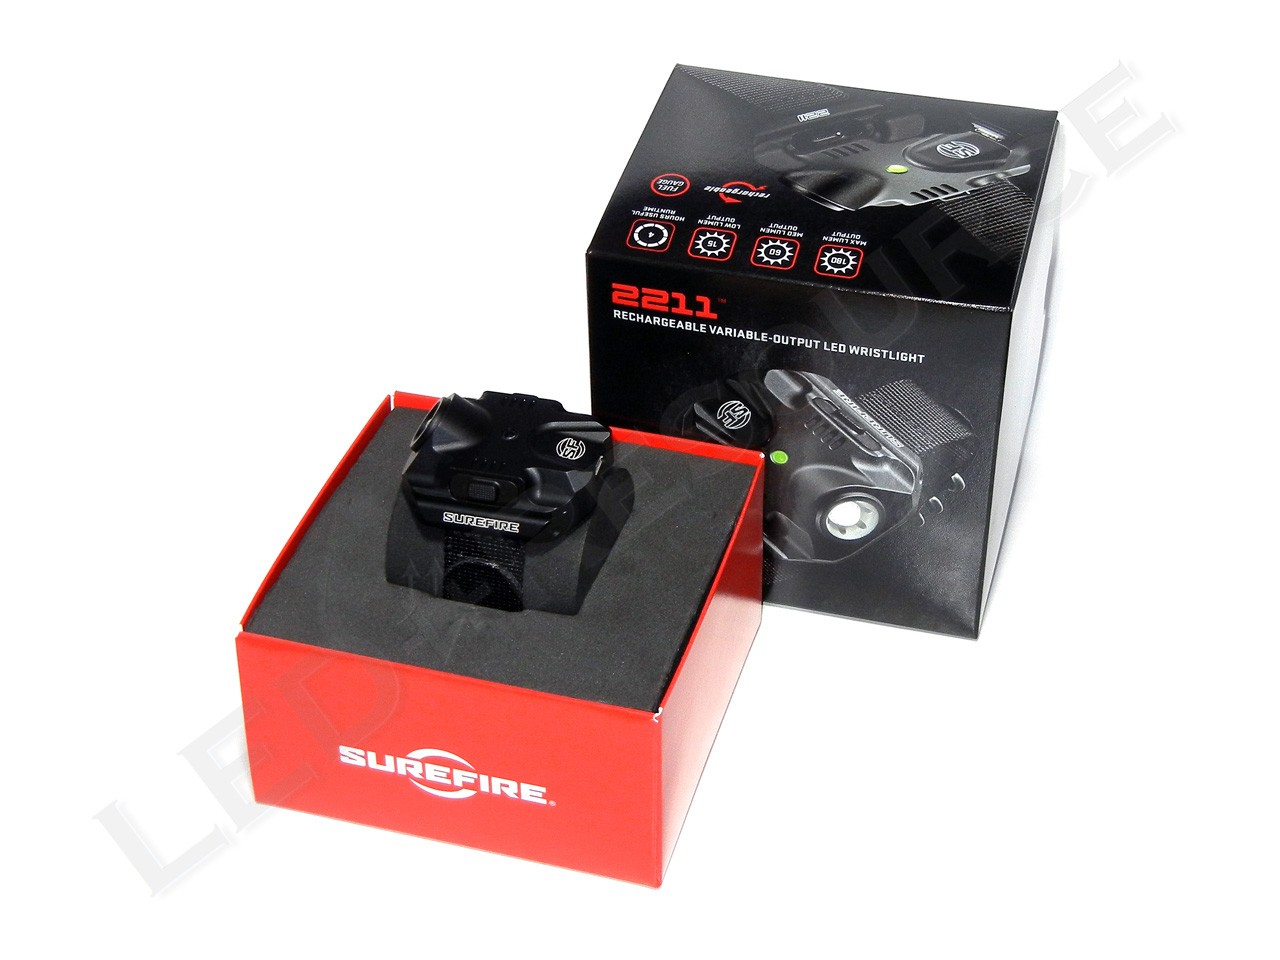 SureFire 2211 WristLight Review